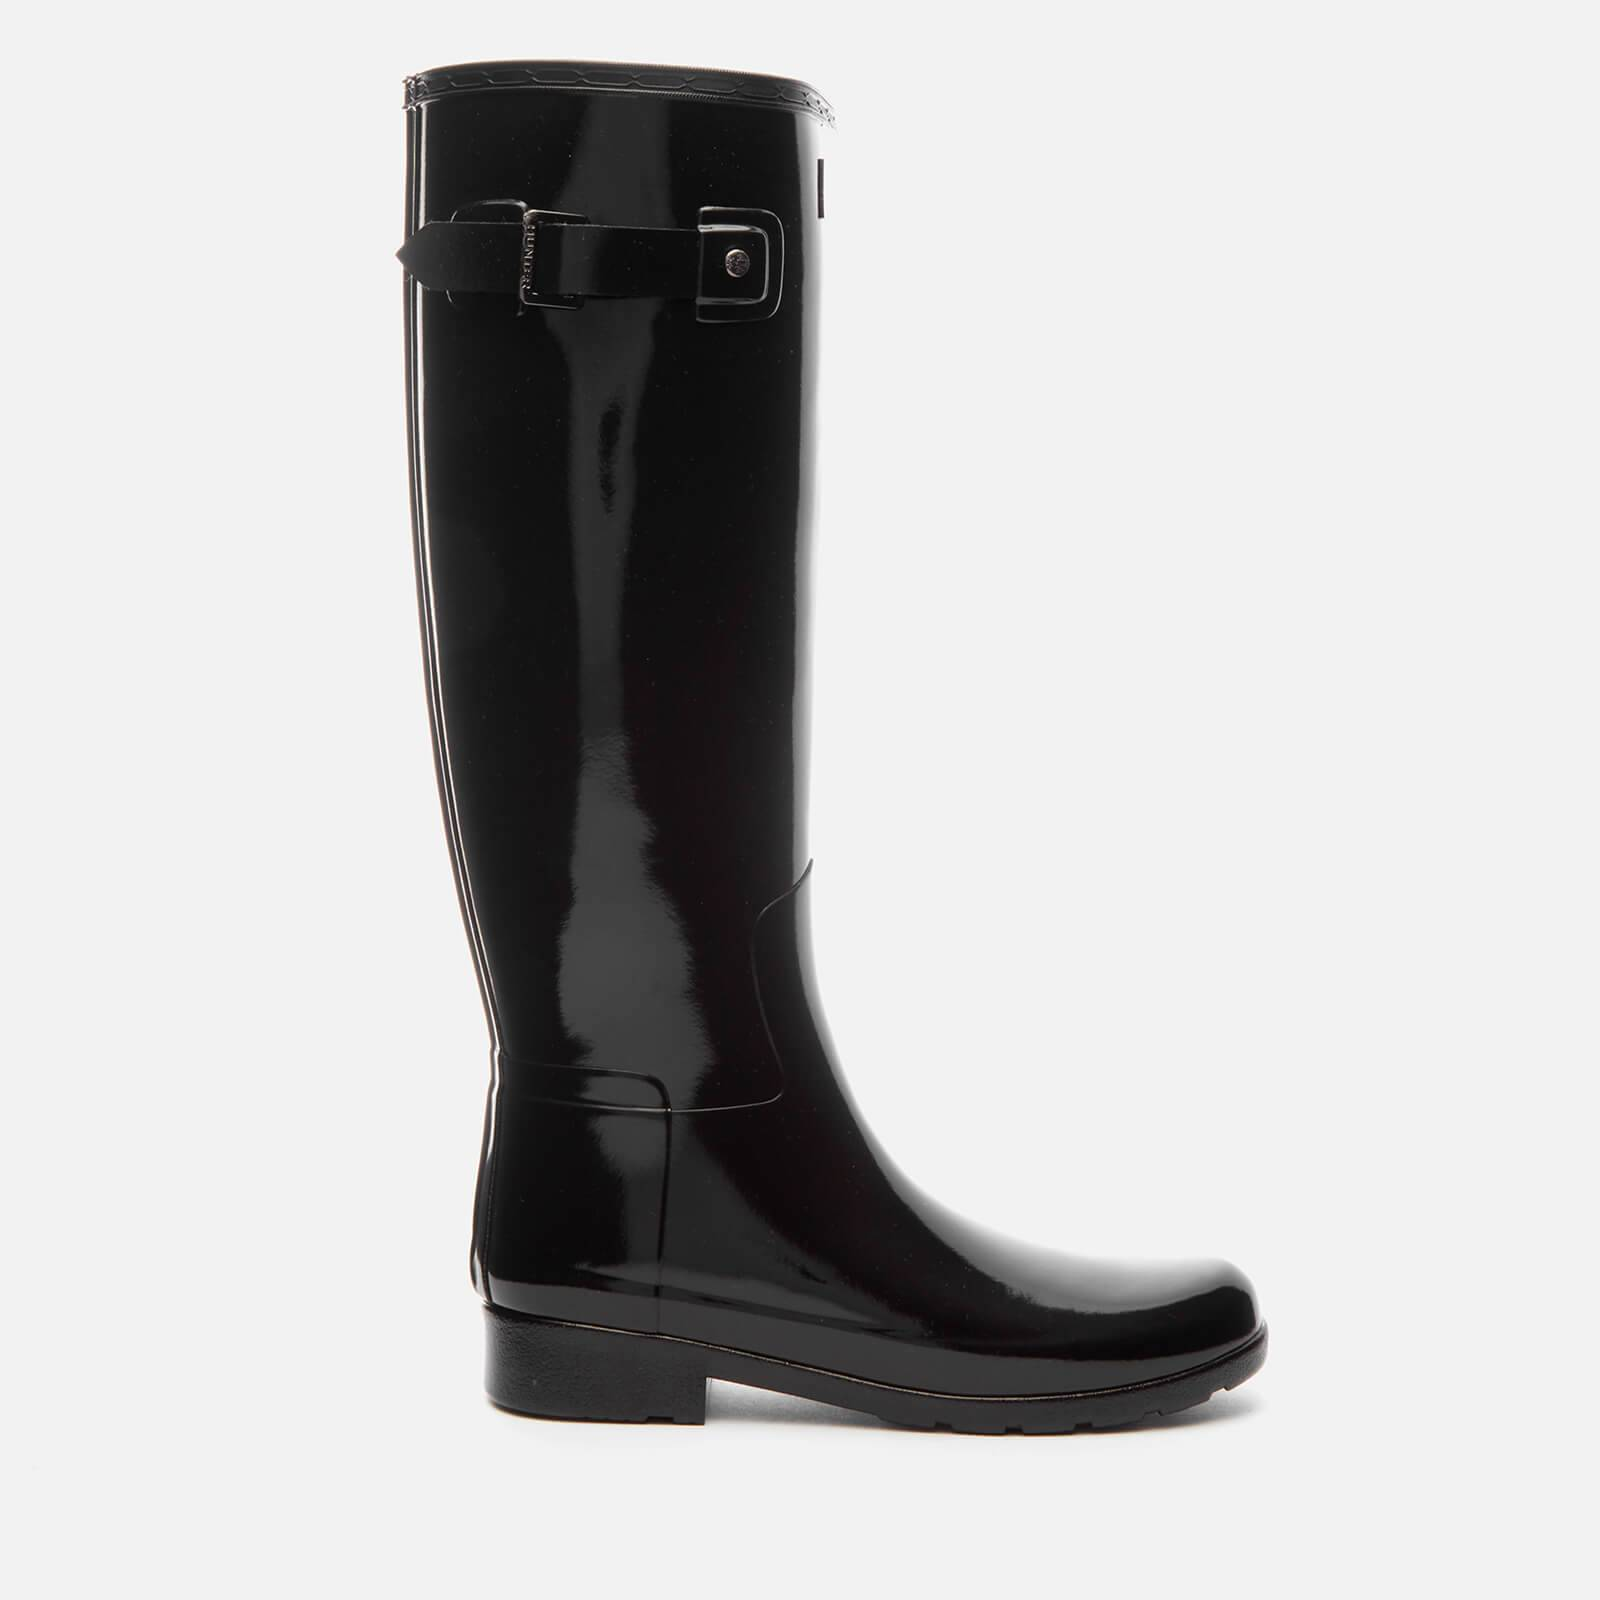 Hunter Women's Original Refined Gloss Tall Wellies - Black - UK 4 - Black